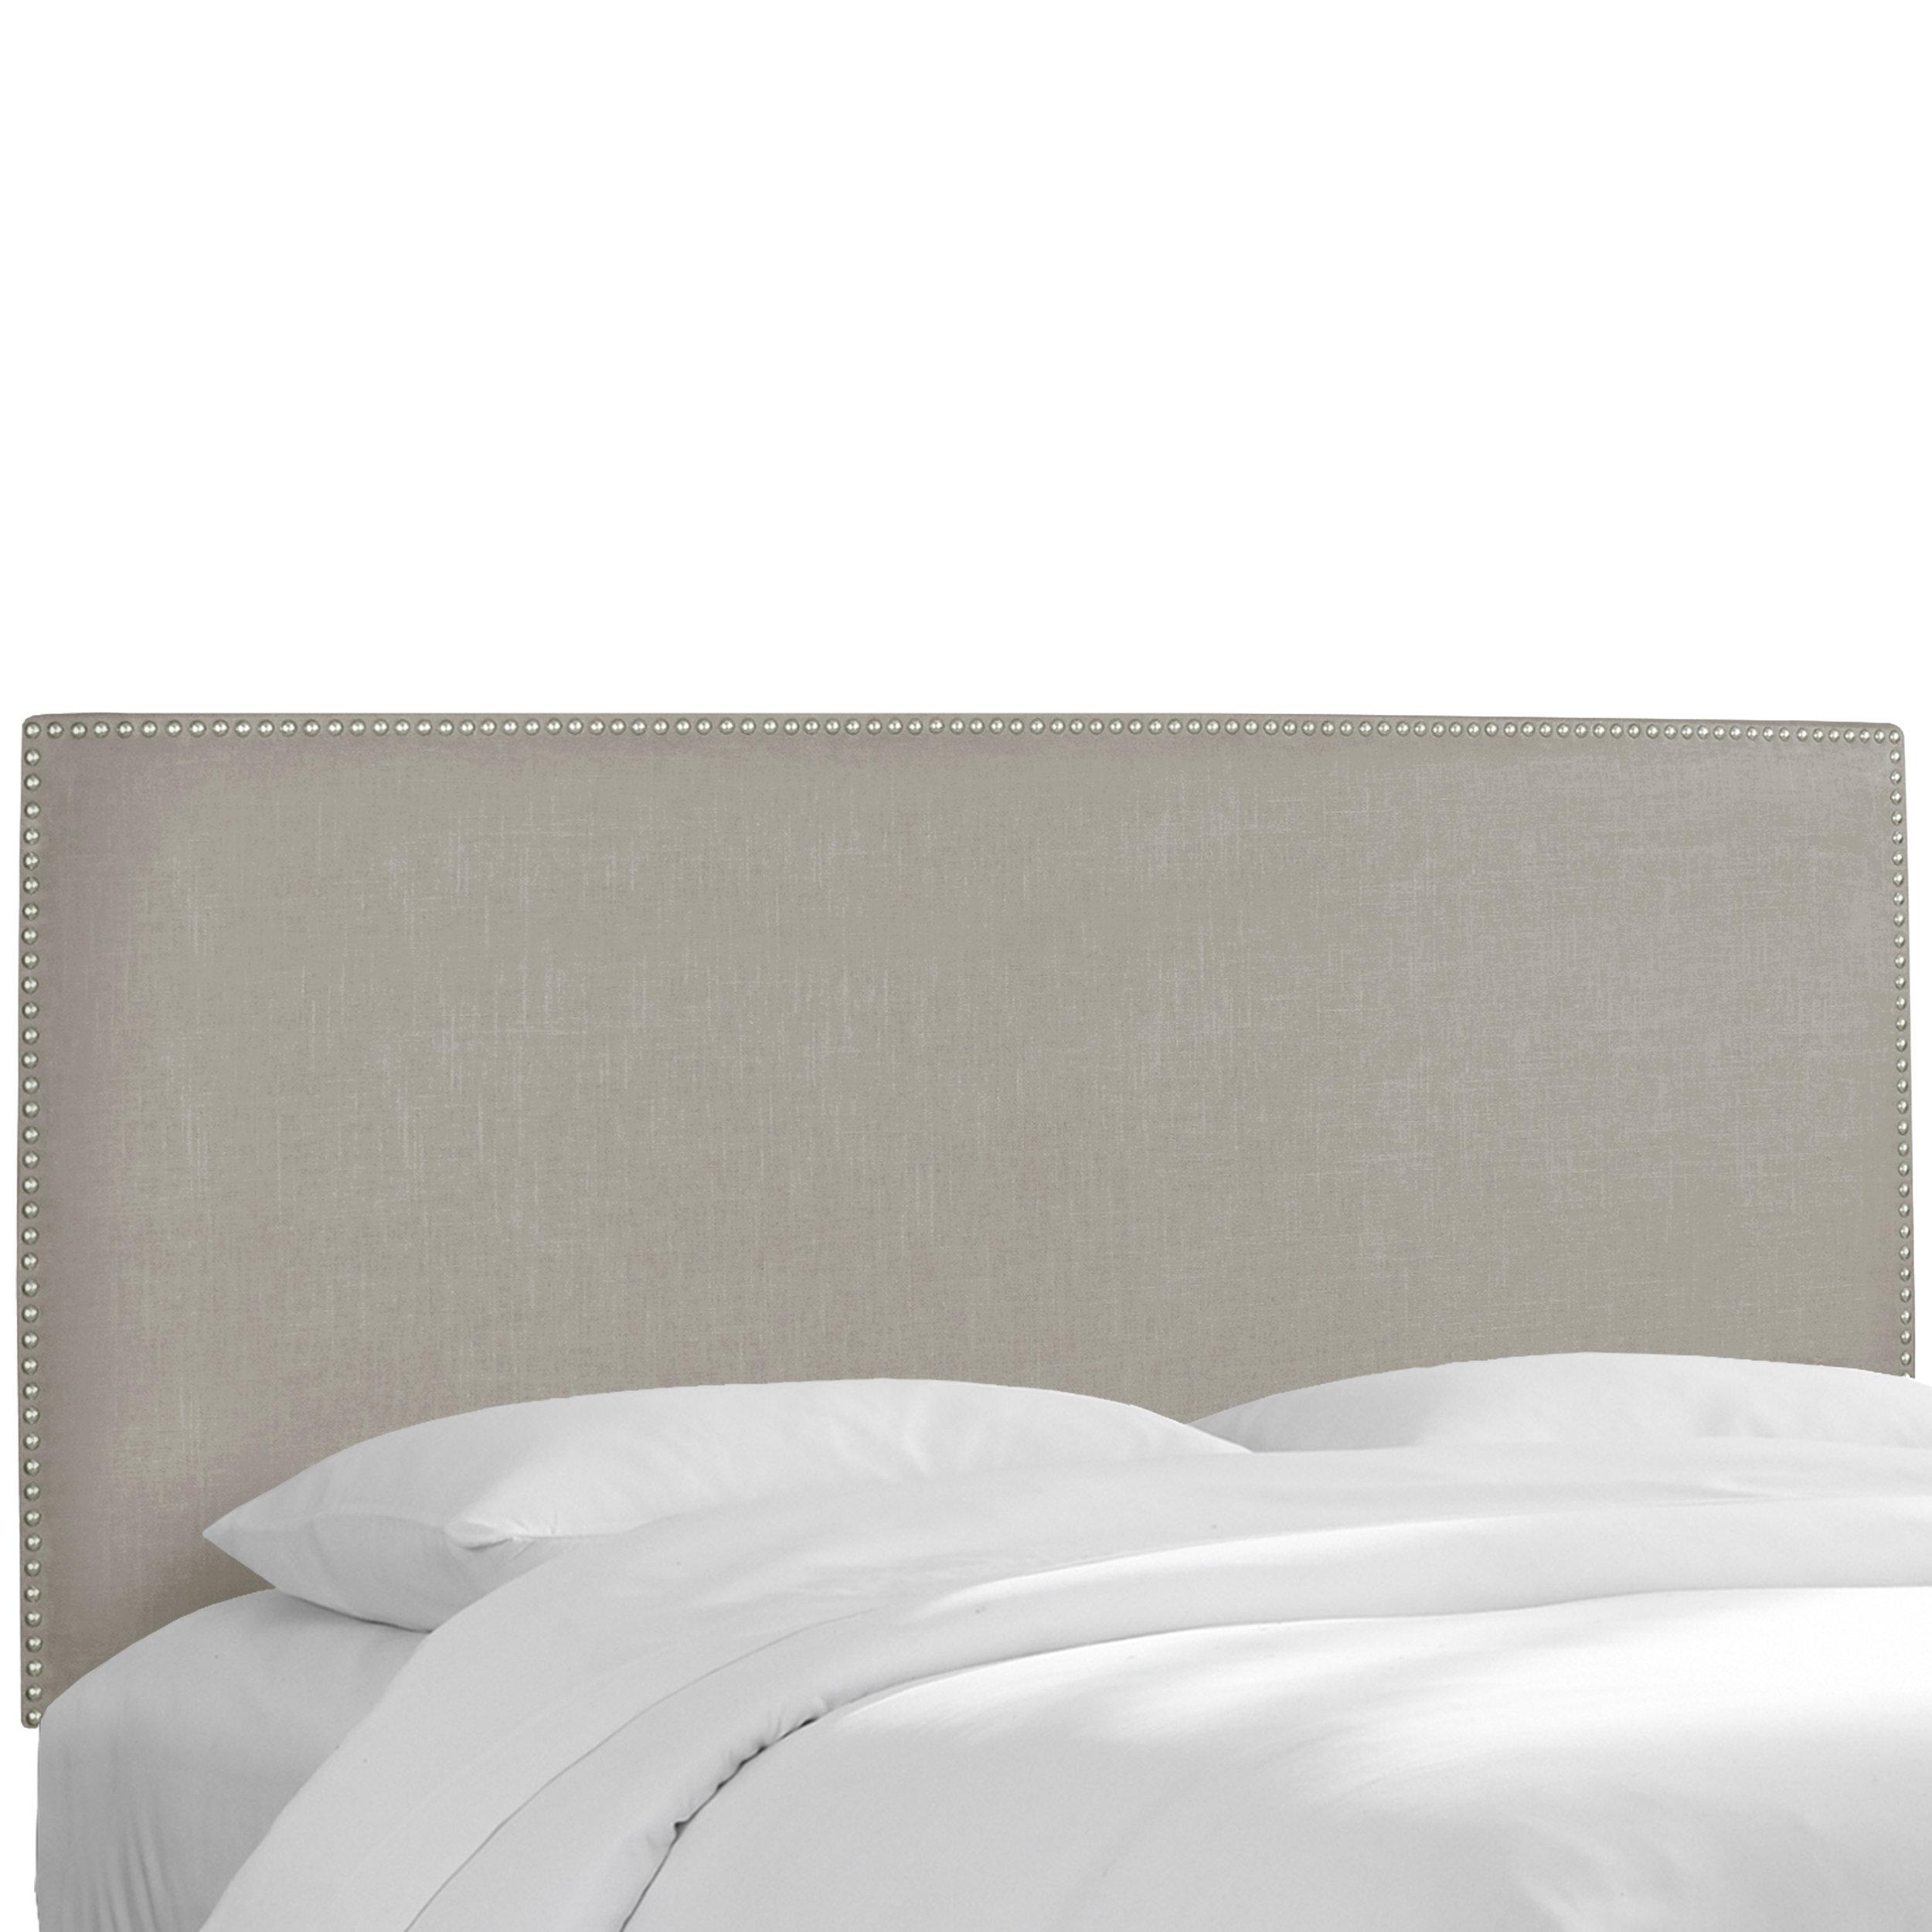 napa upholstered panel headboard : king :$371